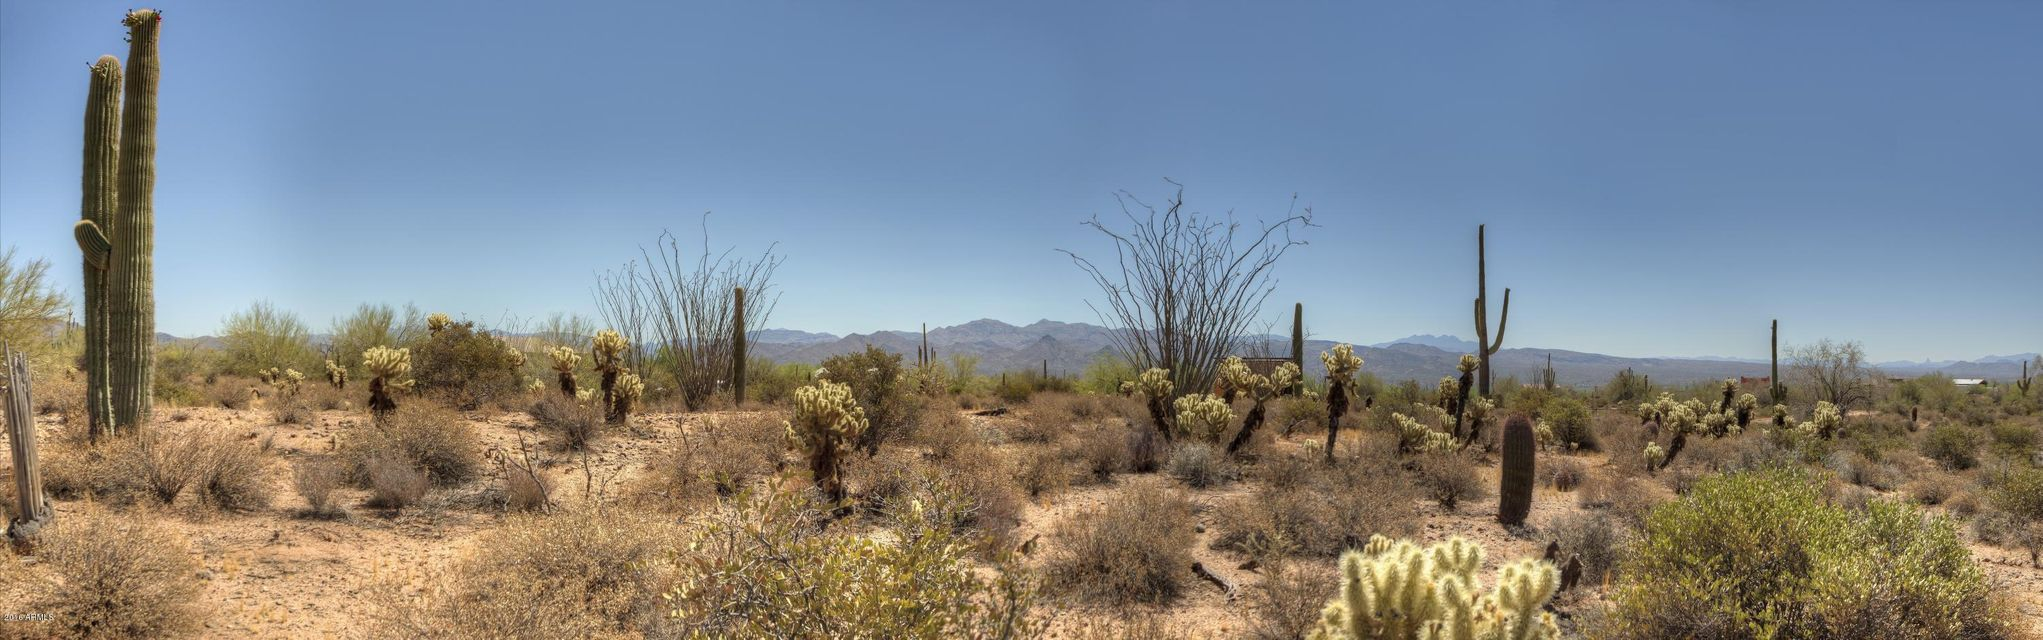 17400 E Lowden Road, Scottsdale, AZ 85263